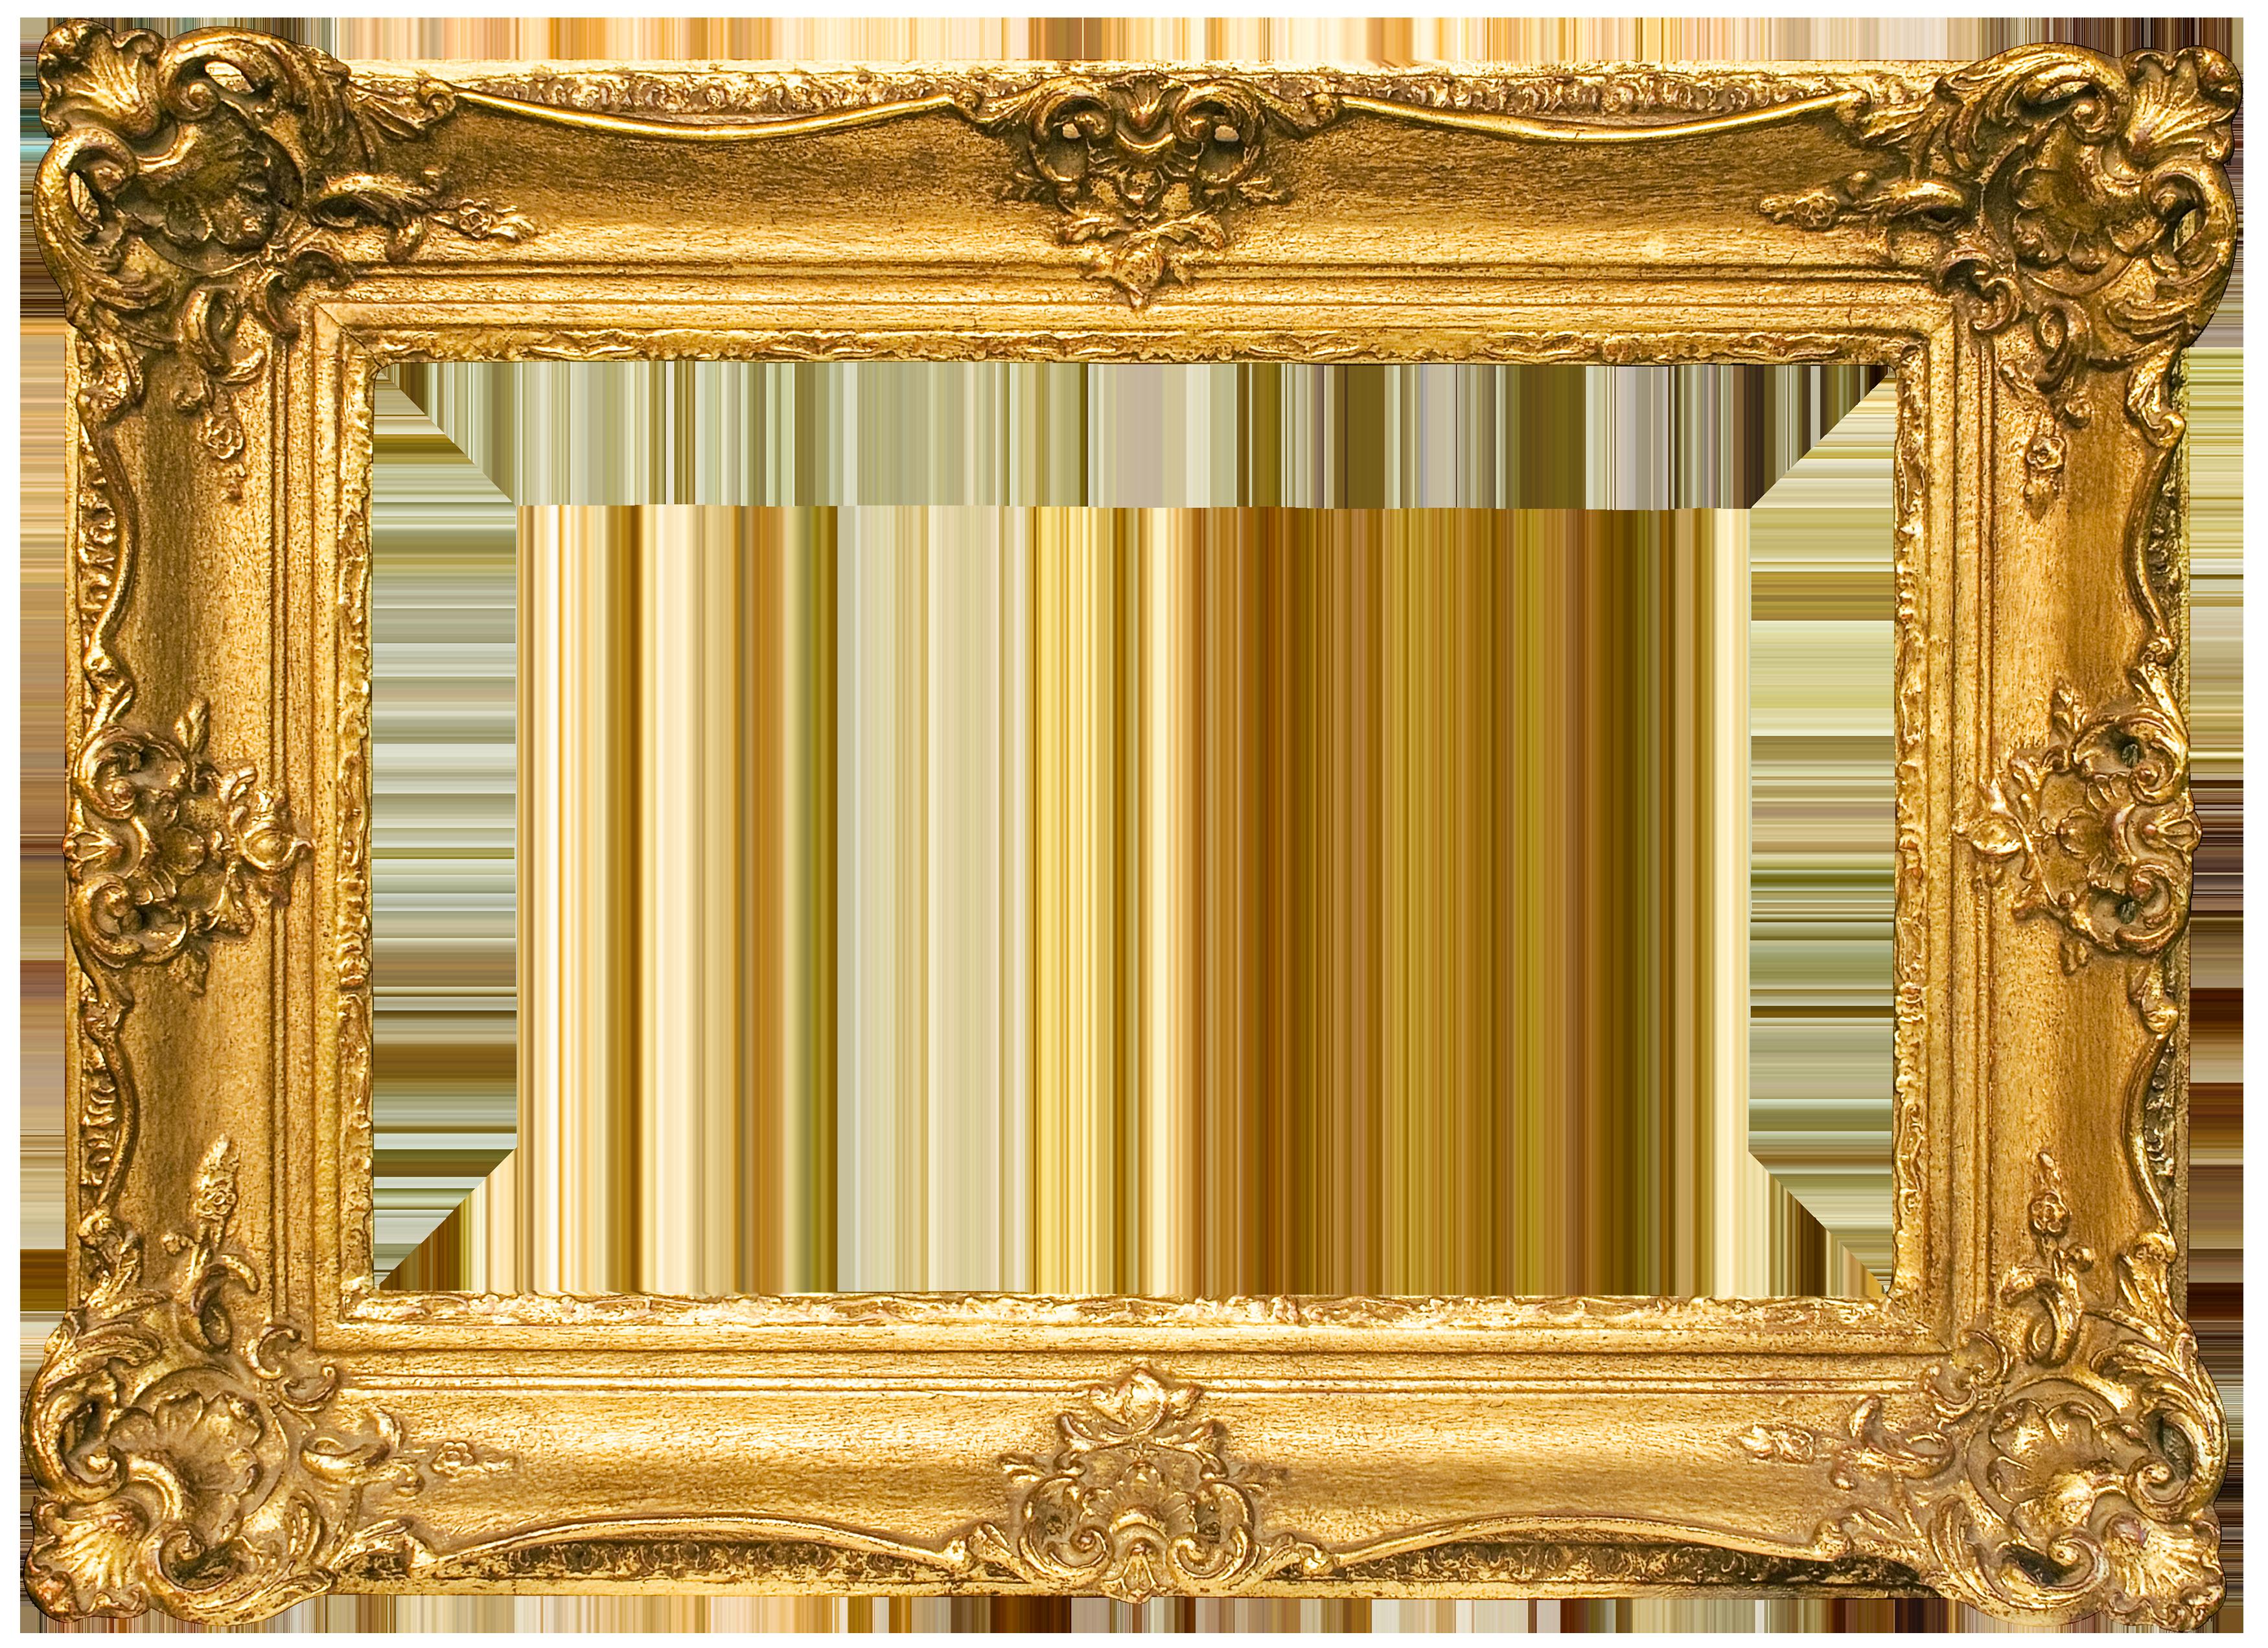 Classic Gold Frame Transparent PNG Image.